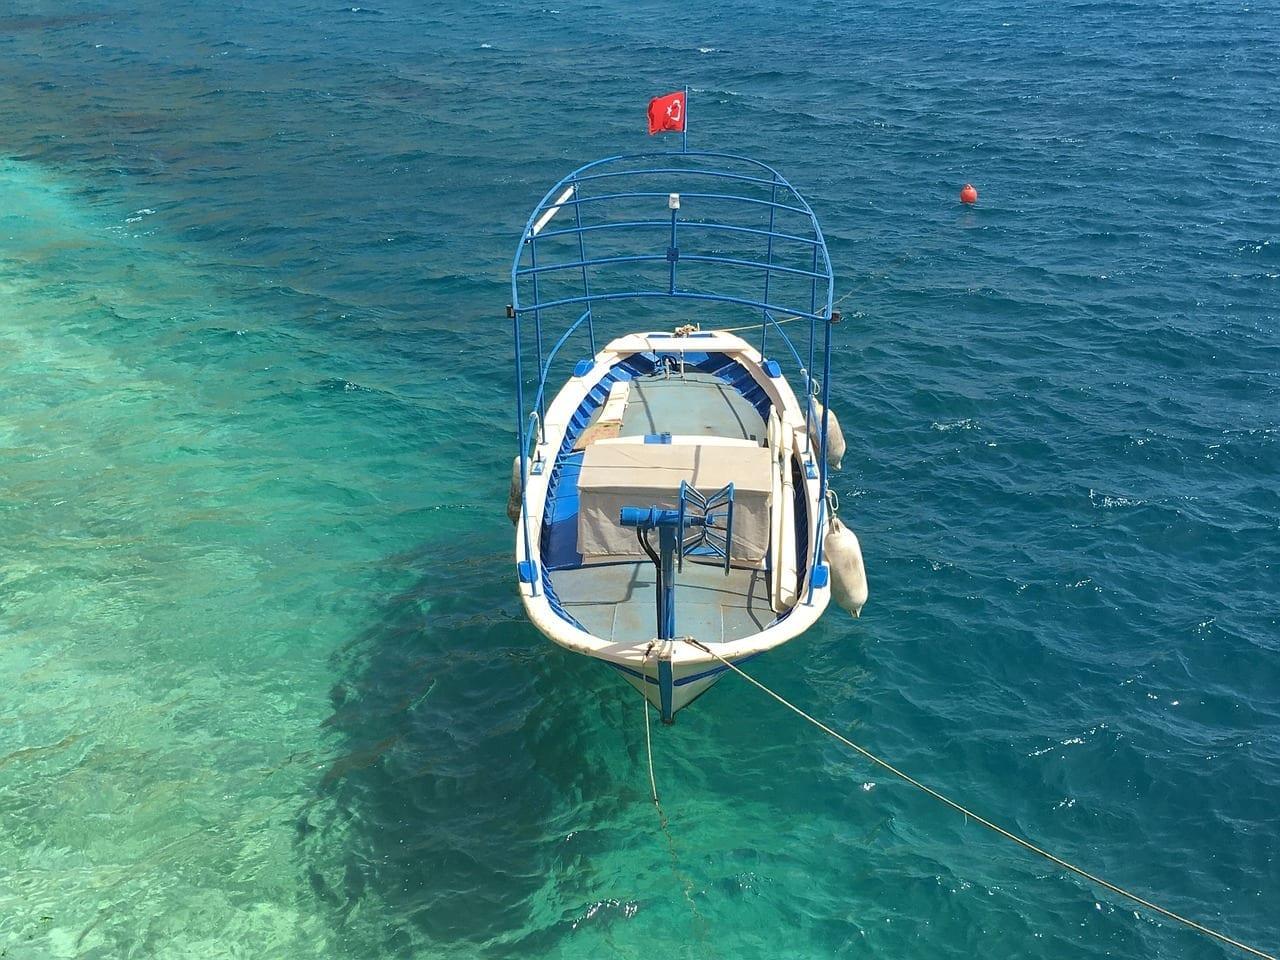 Kalkan Barco De Pesca Mar Egeo Turquía